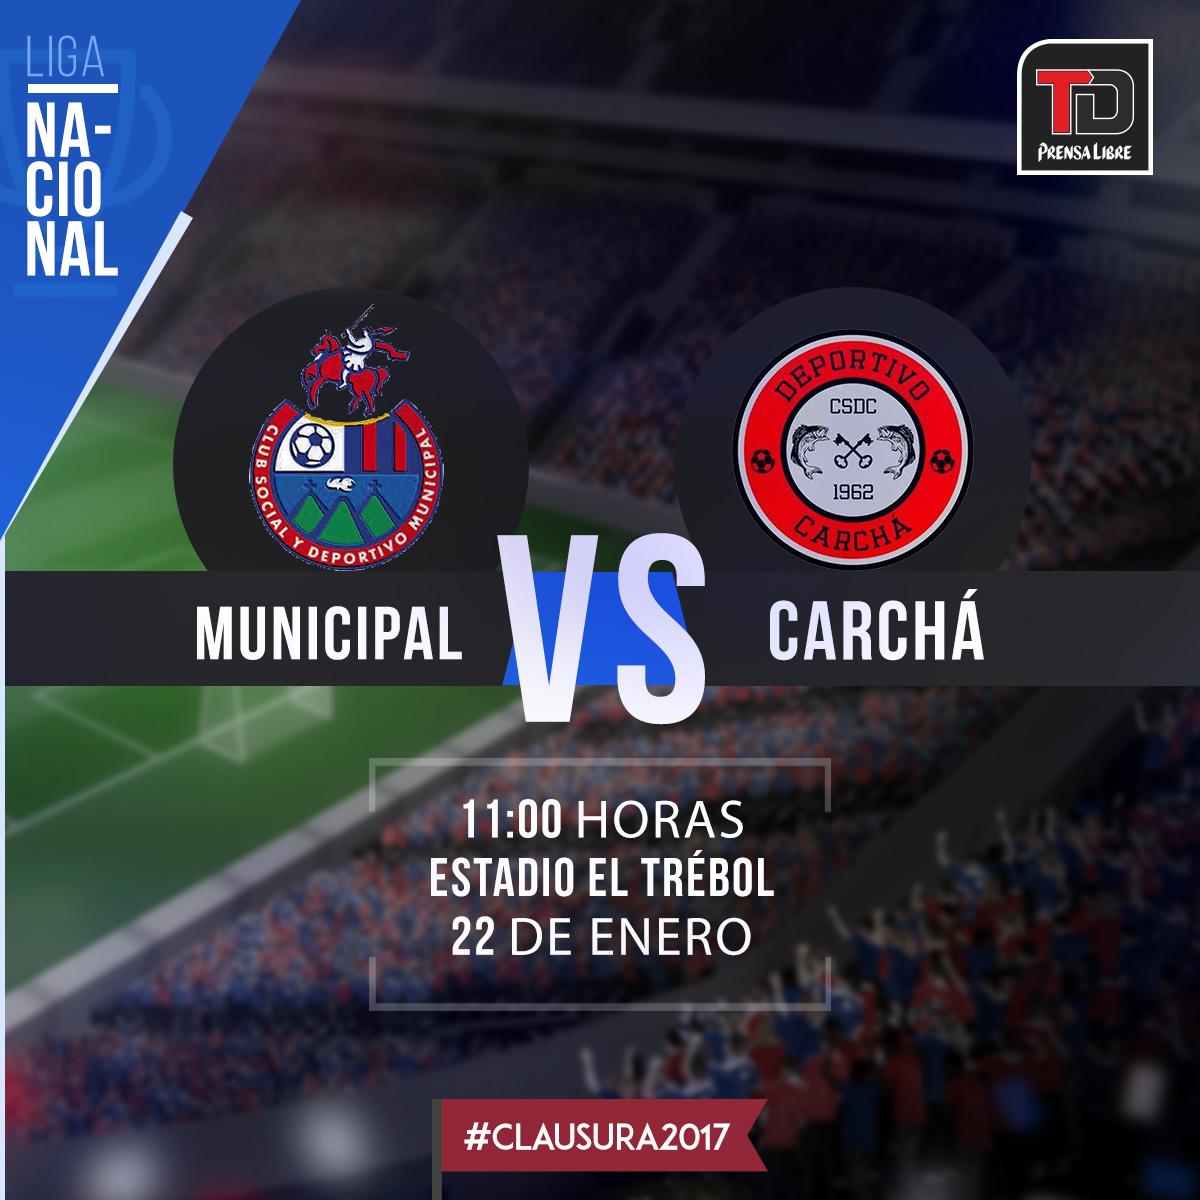 EN DIRECTO | Municipal vs. Carchá